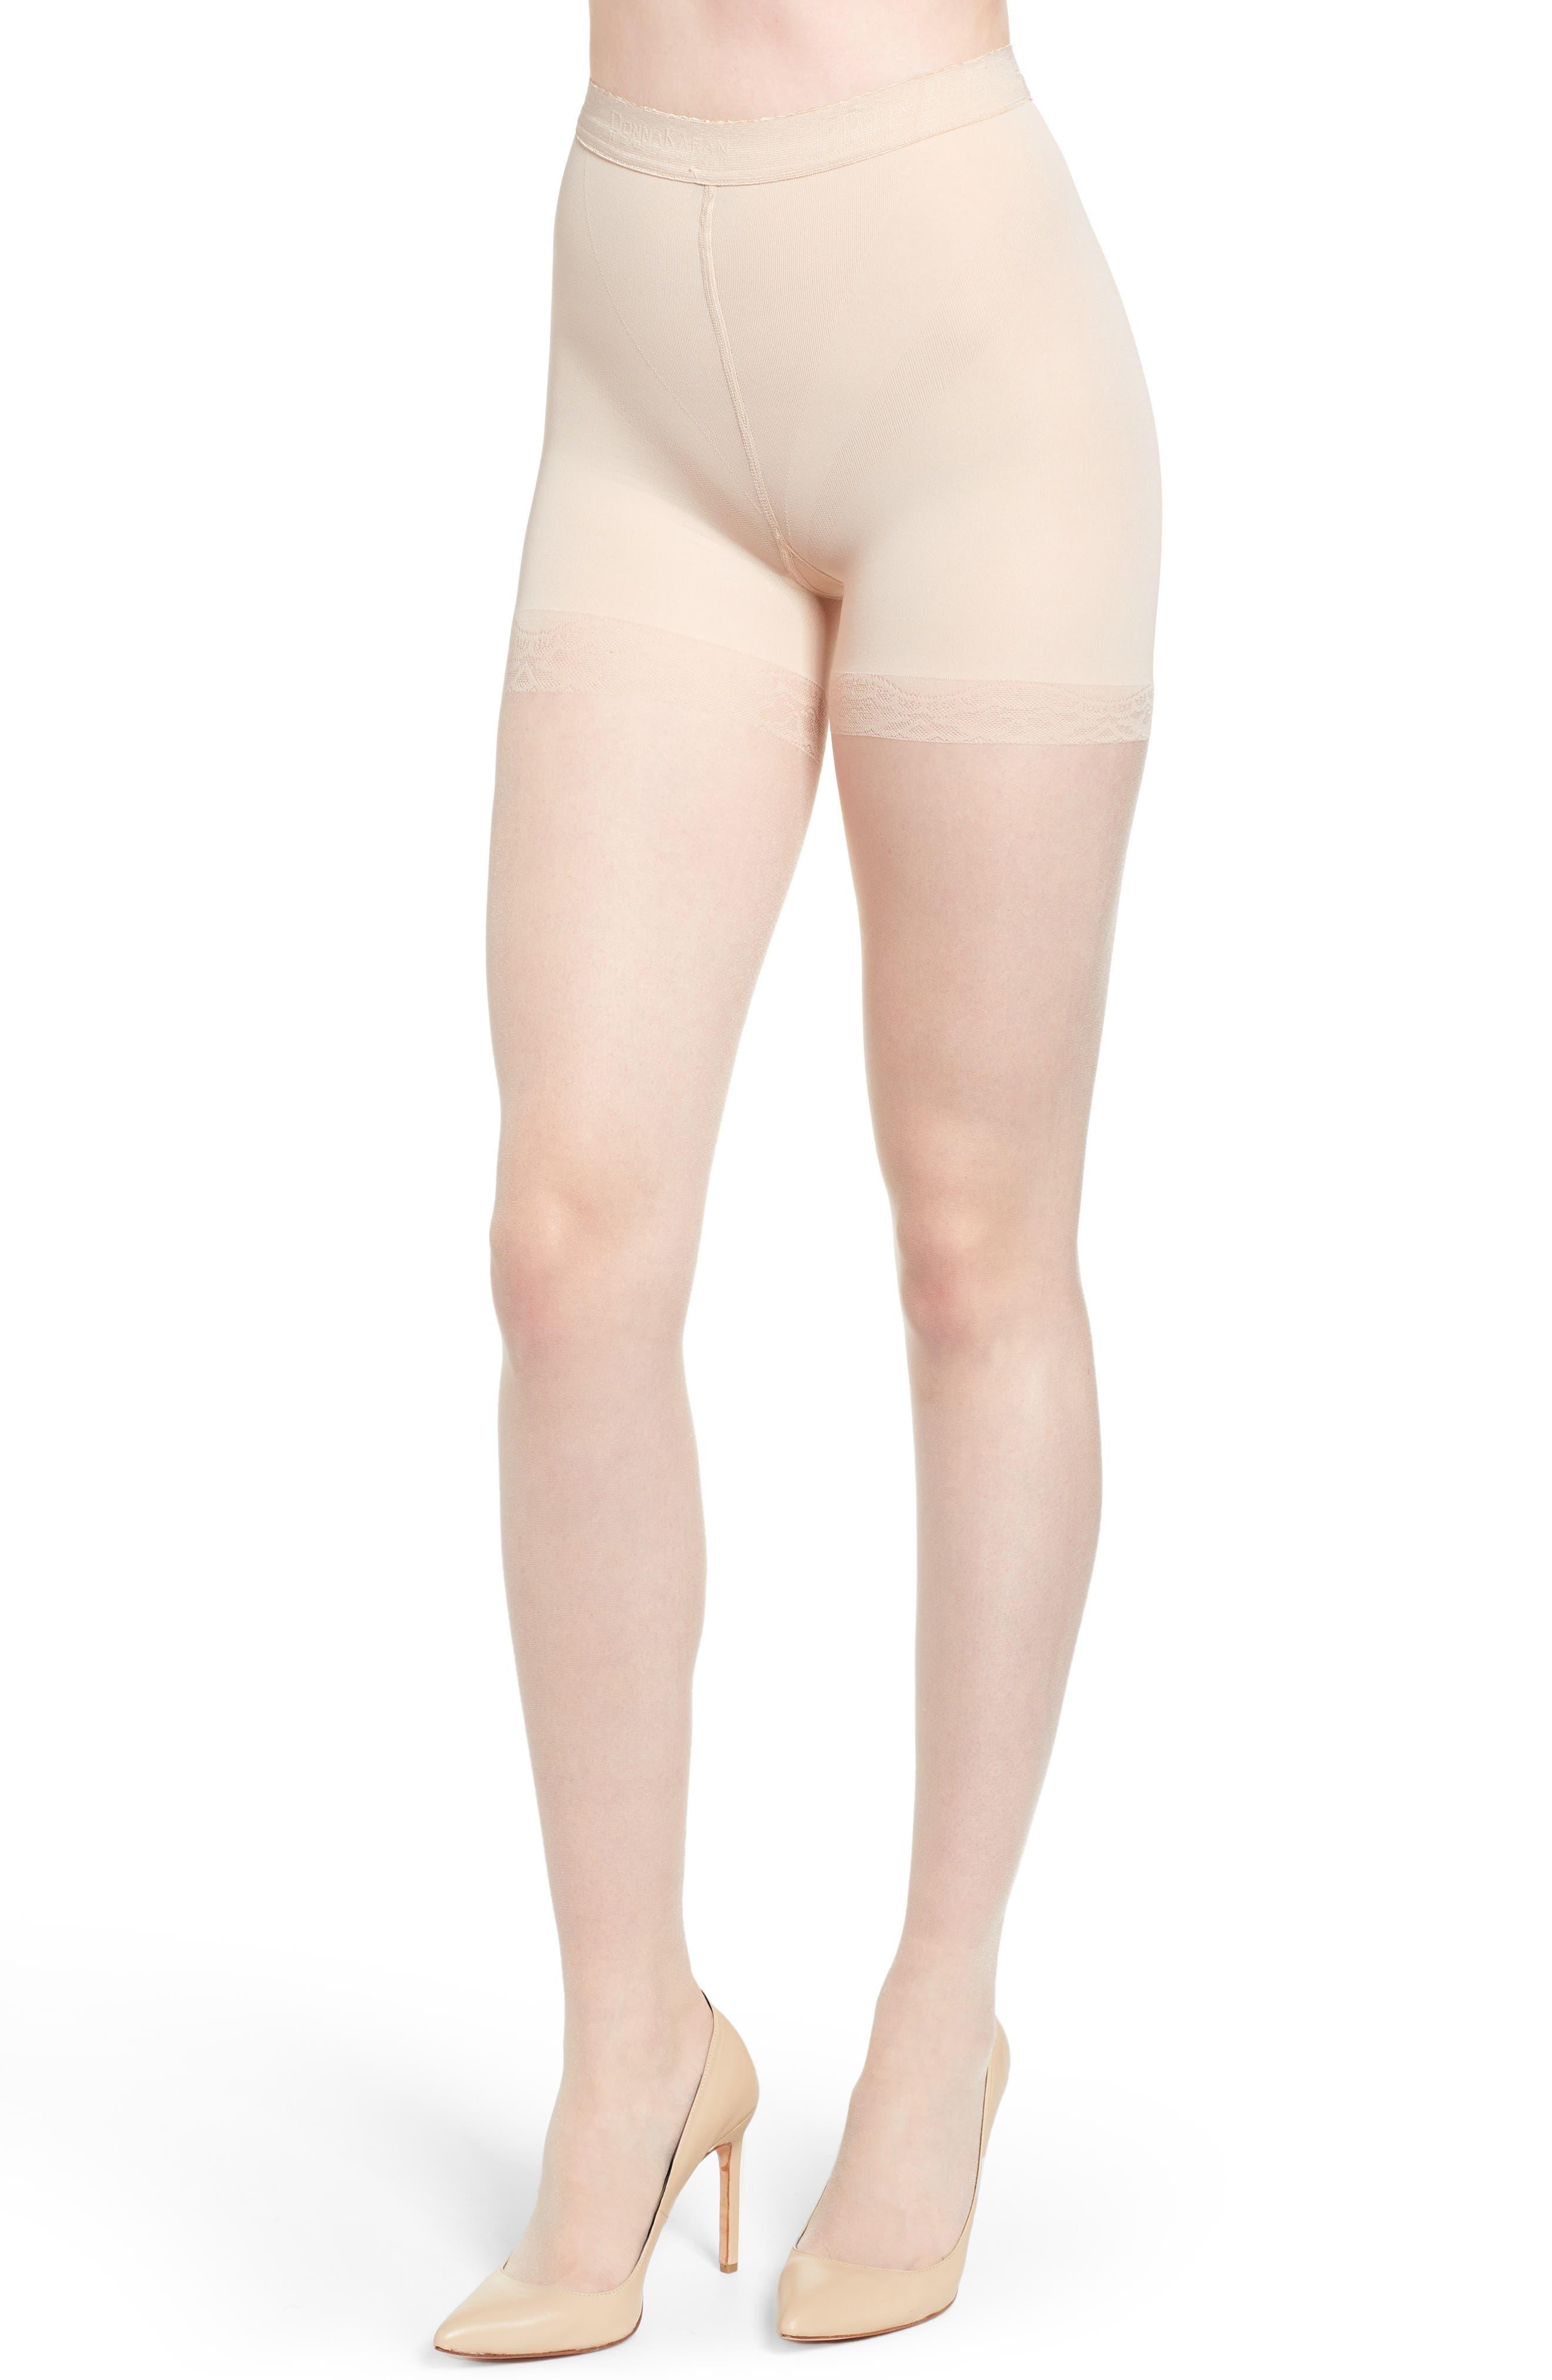 Donna Karan The Nudes Pantyhose,                             Alternate thumbnail 2, color,                             A01